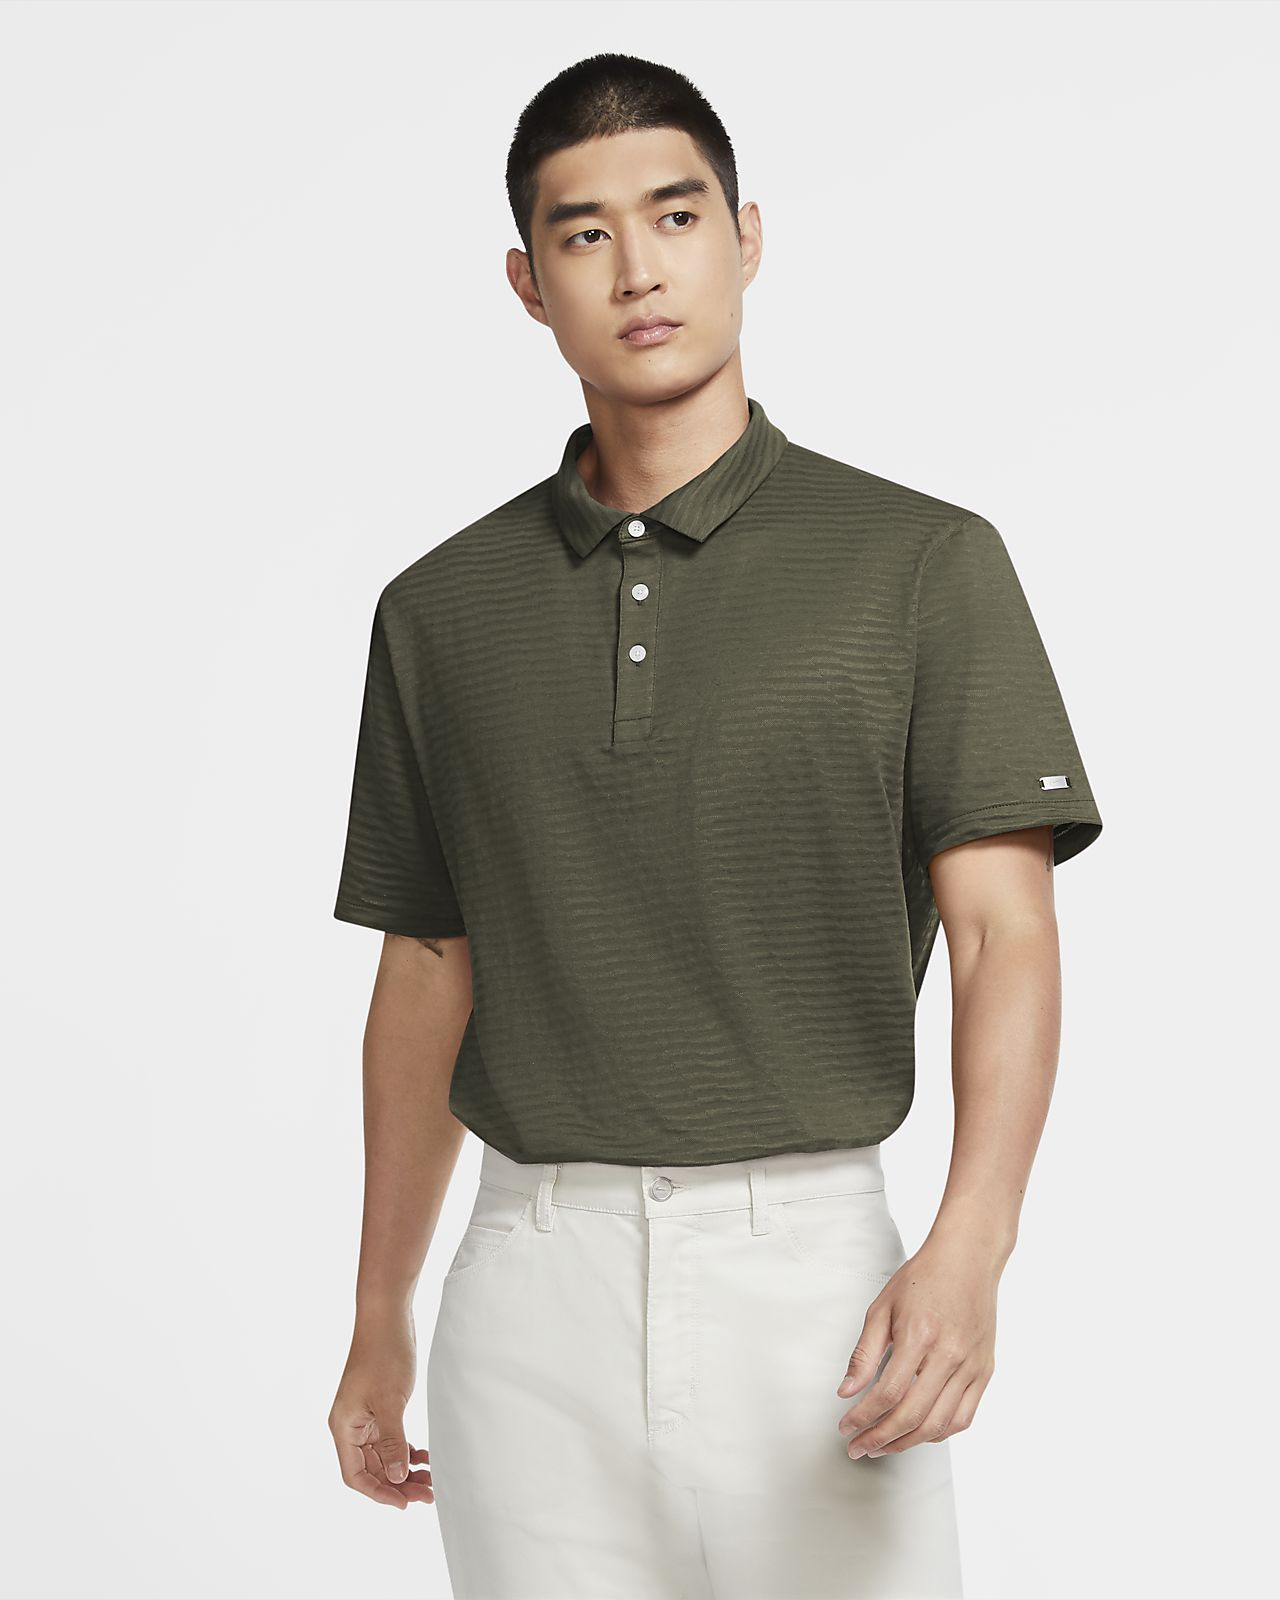 Nike Dri-FIT Player férfi golfpóló